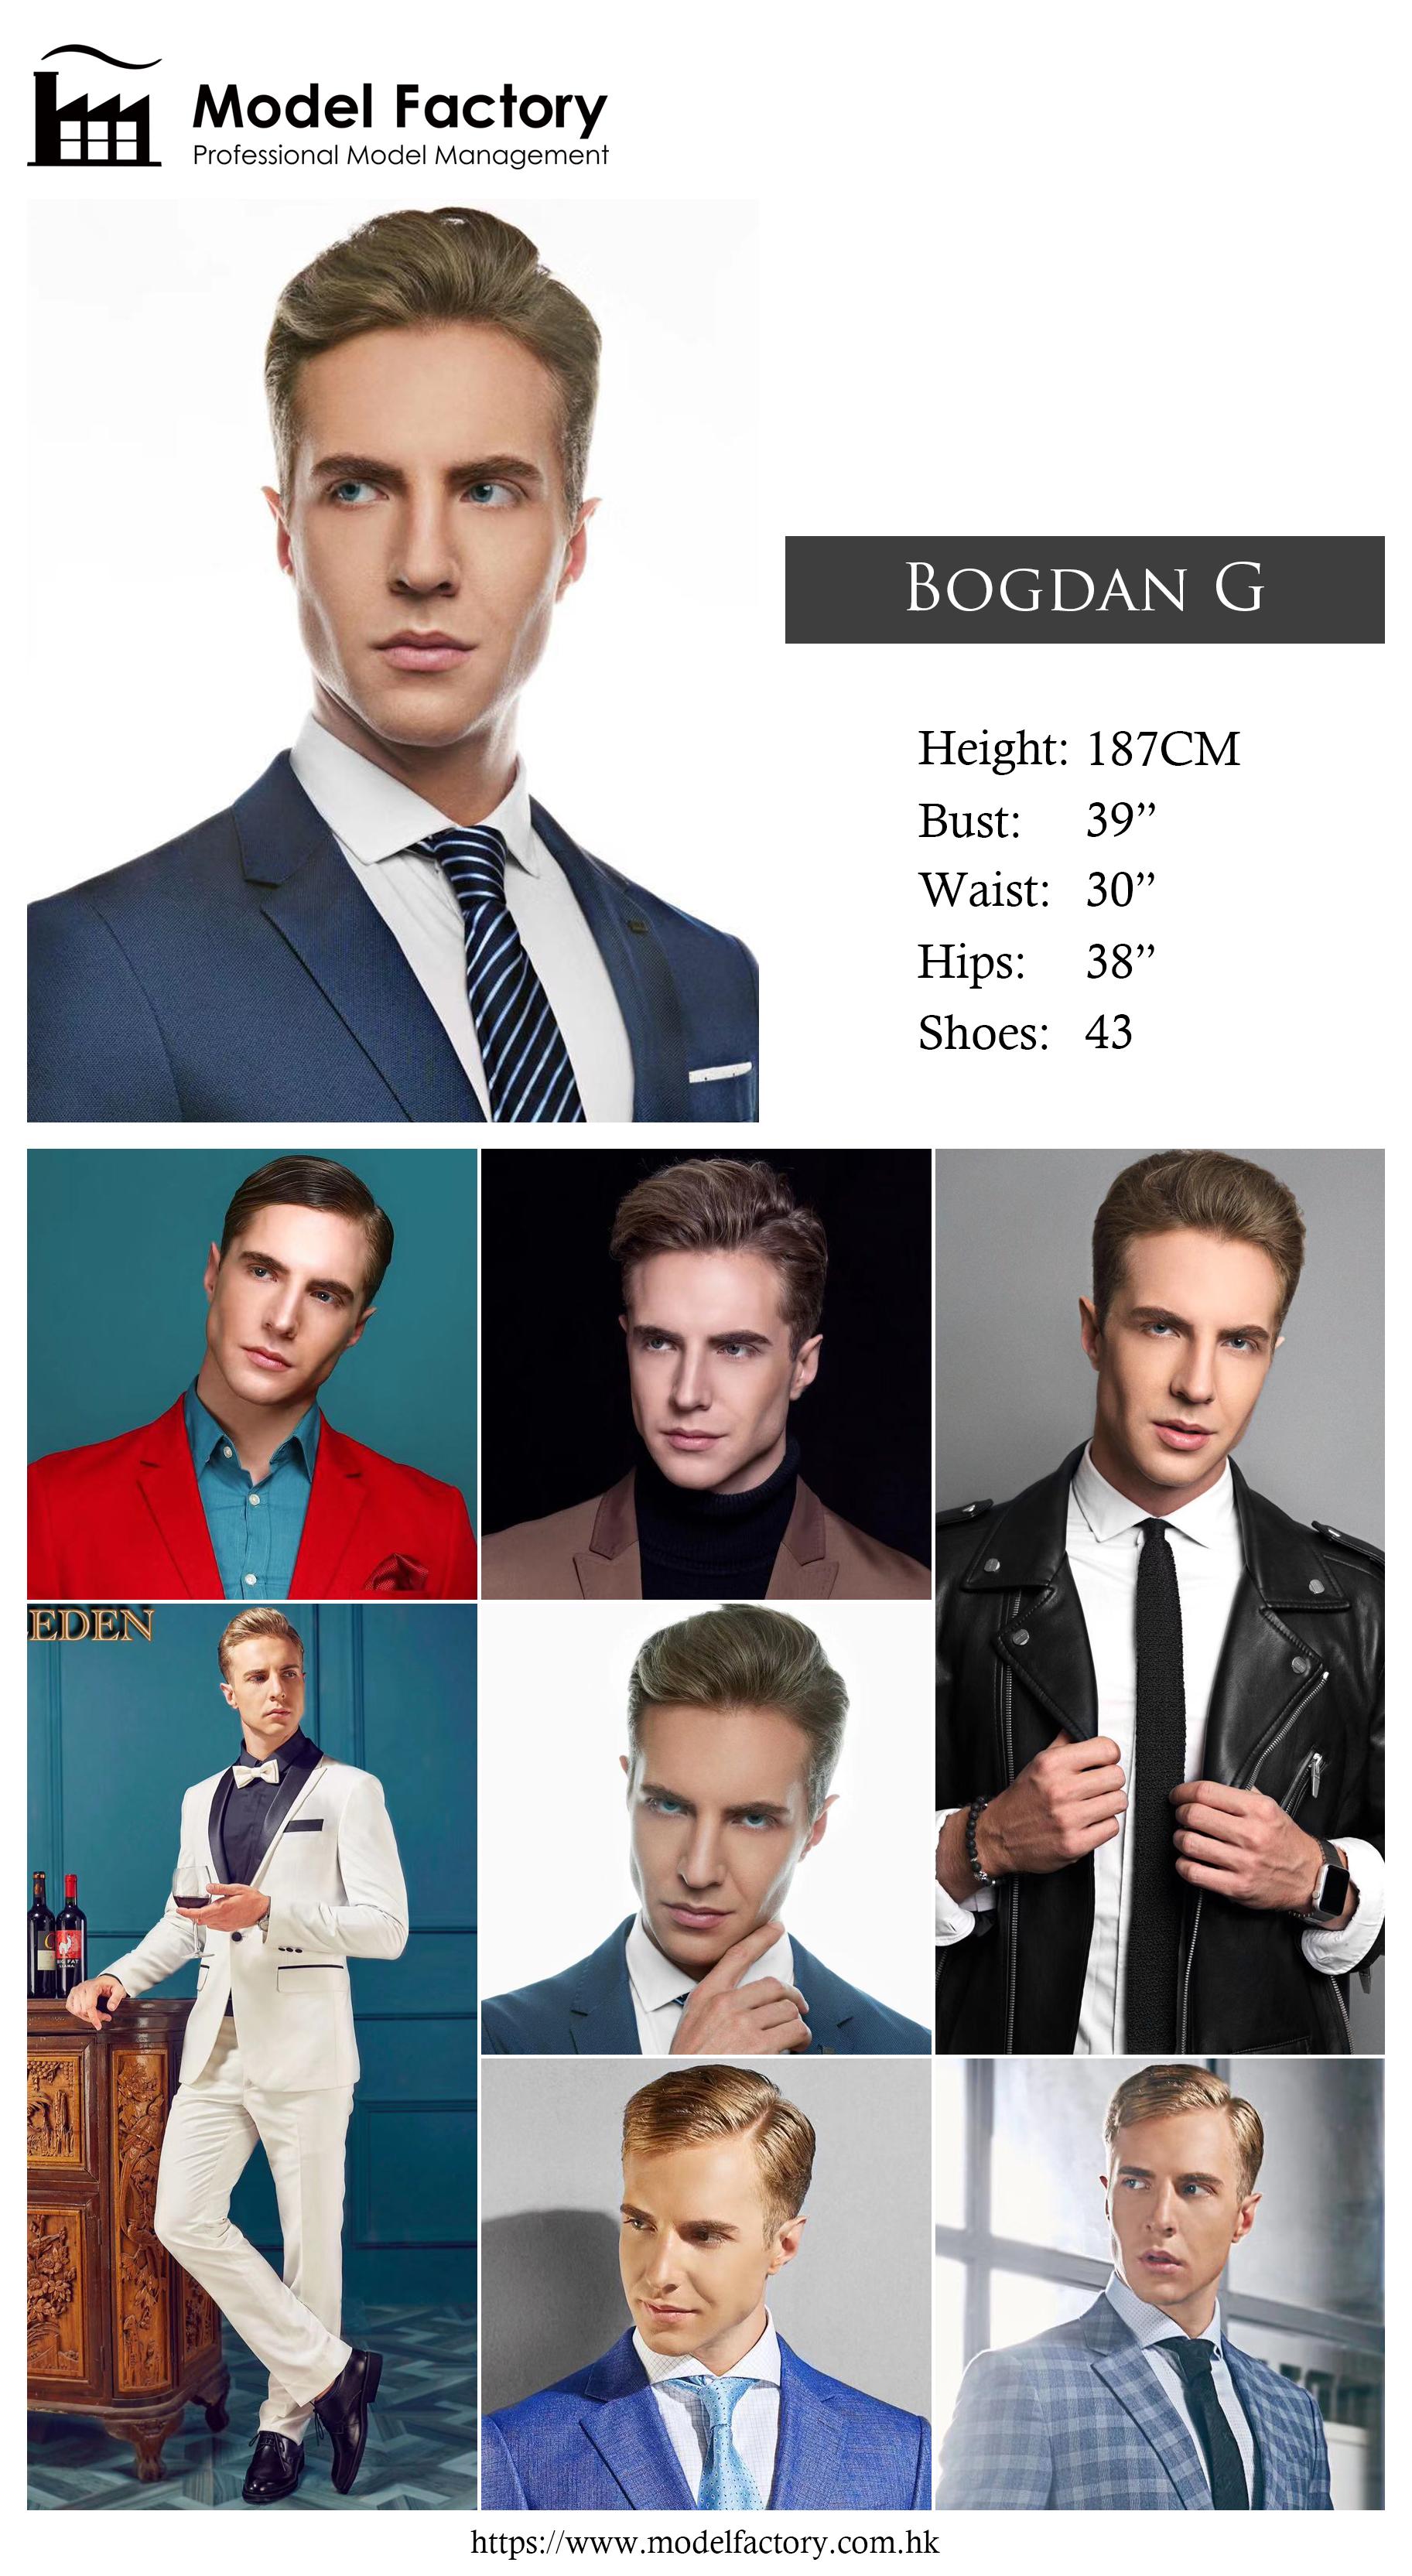 Model Factory Caucasian Male Model BogdanG